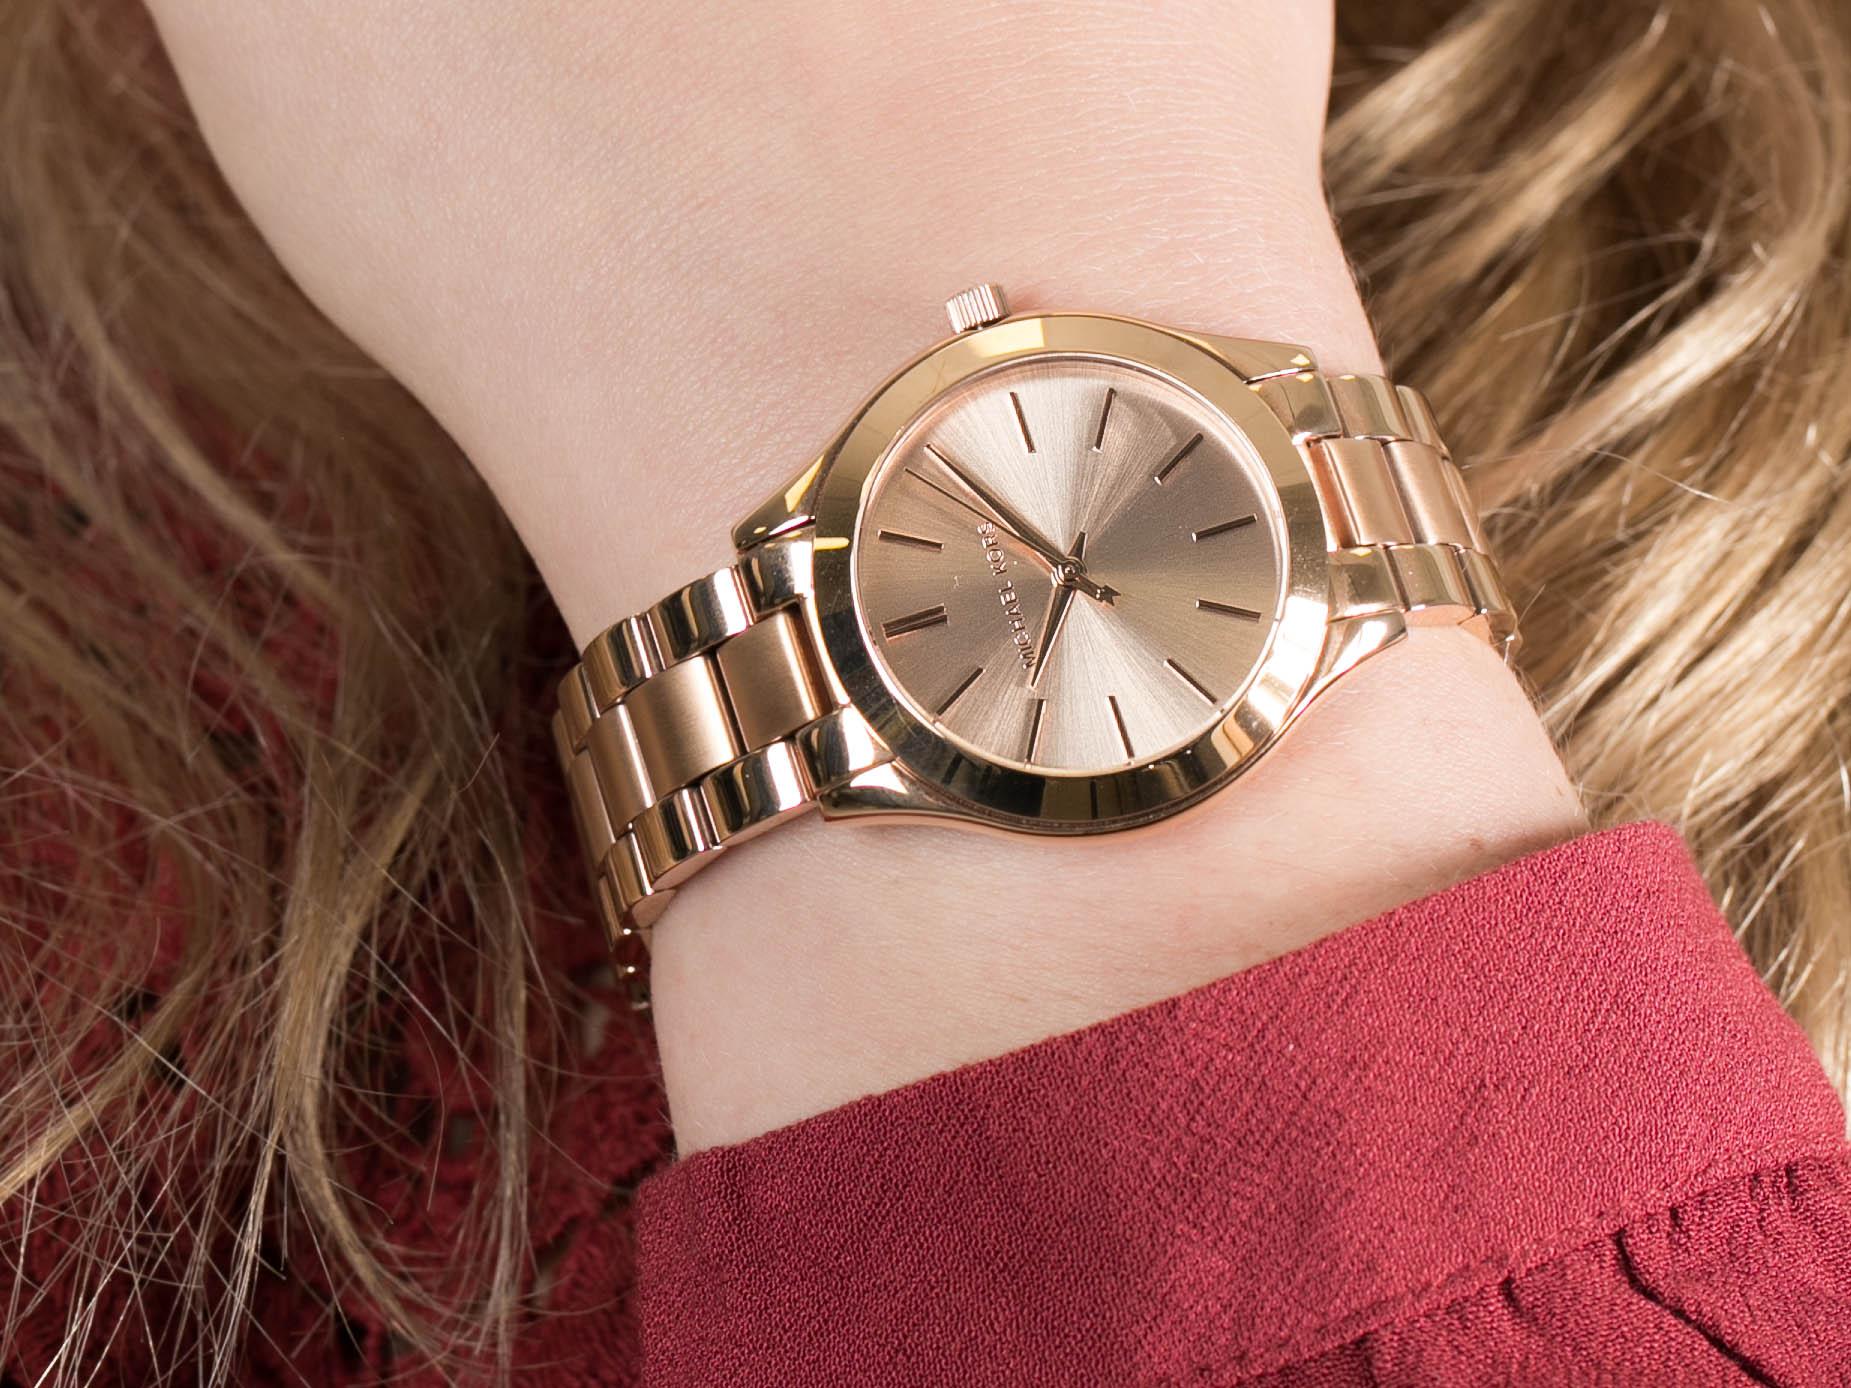 Michael Kors MK3513 MINI SLIM RUNWAY zegarek fashion/modowy Runway